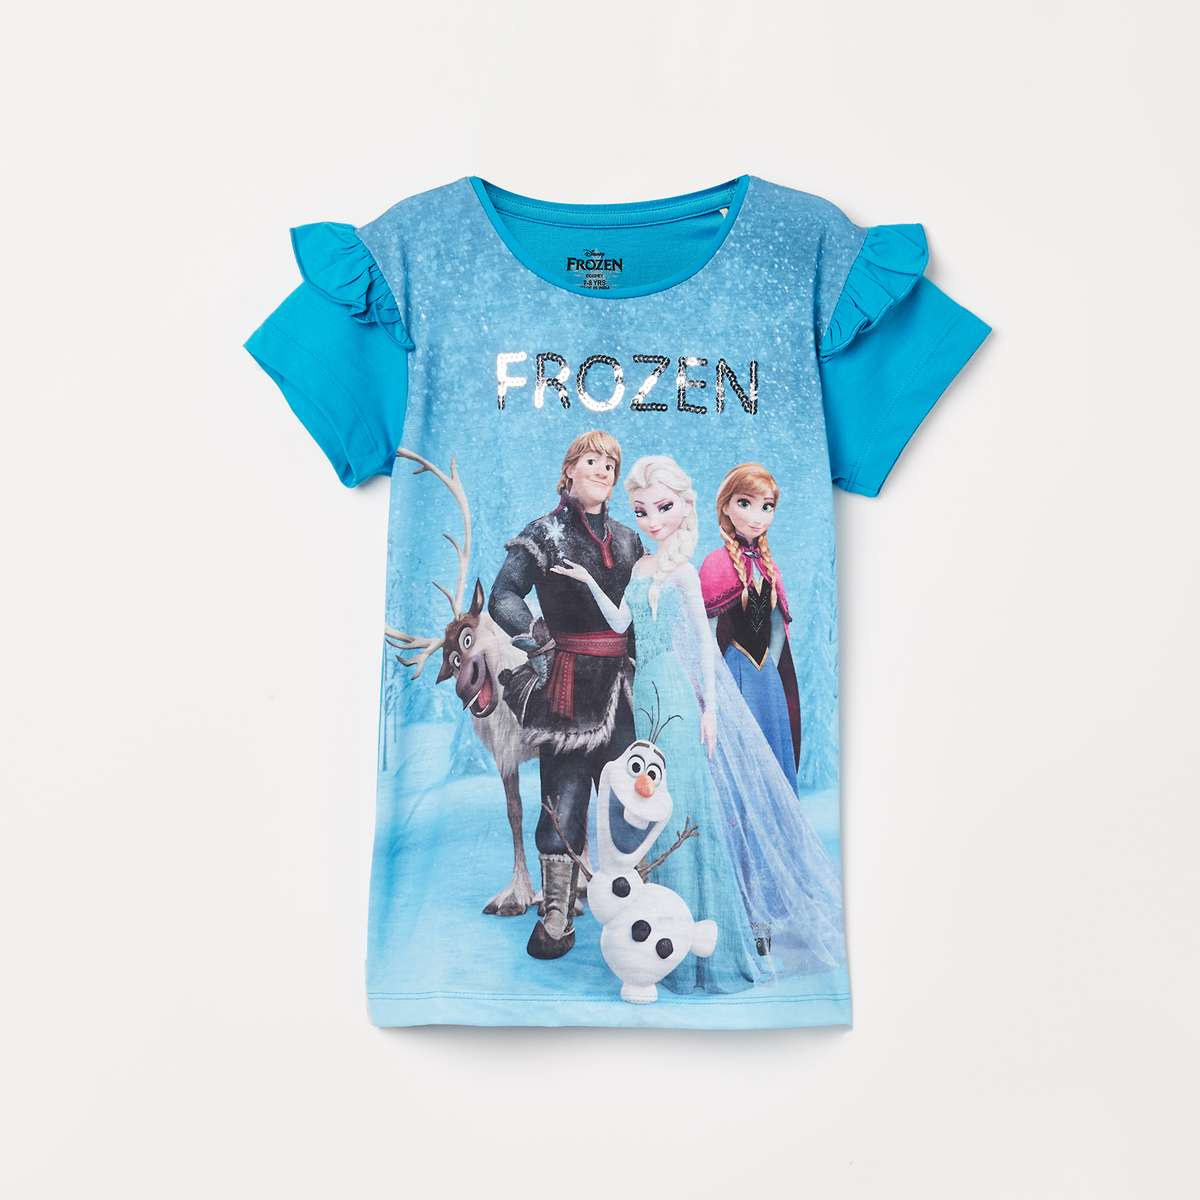 1.KIDSVILLE Girls Frozen Printed Top